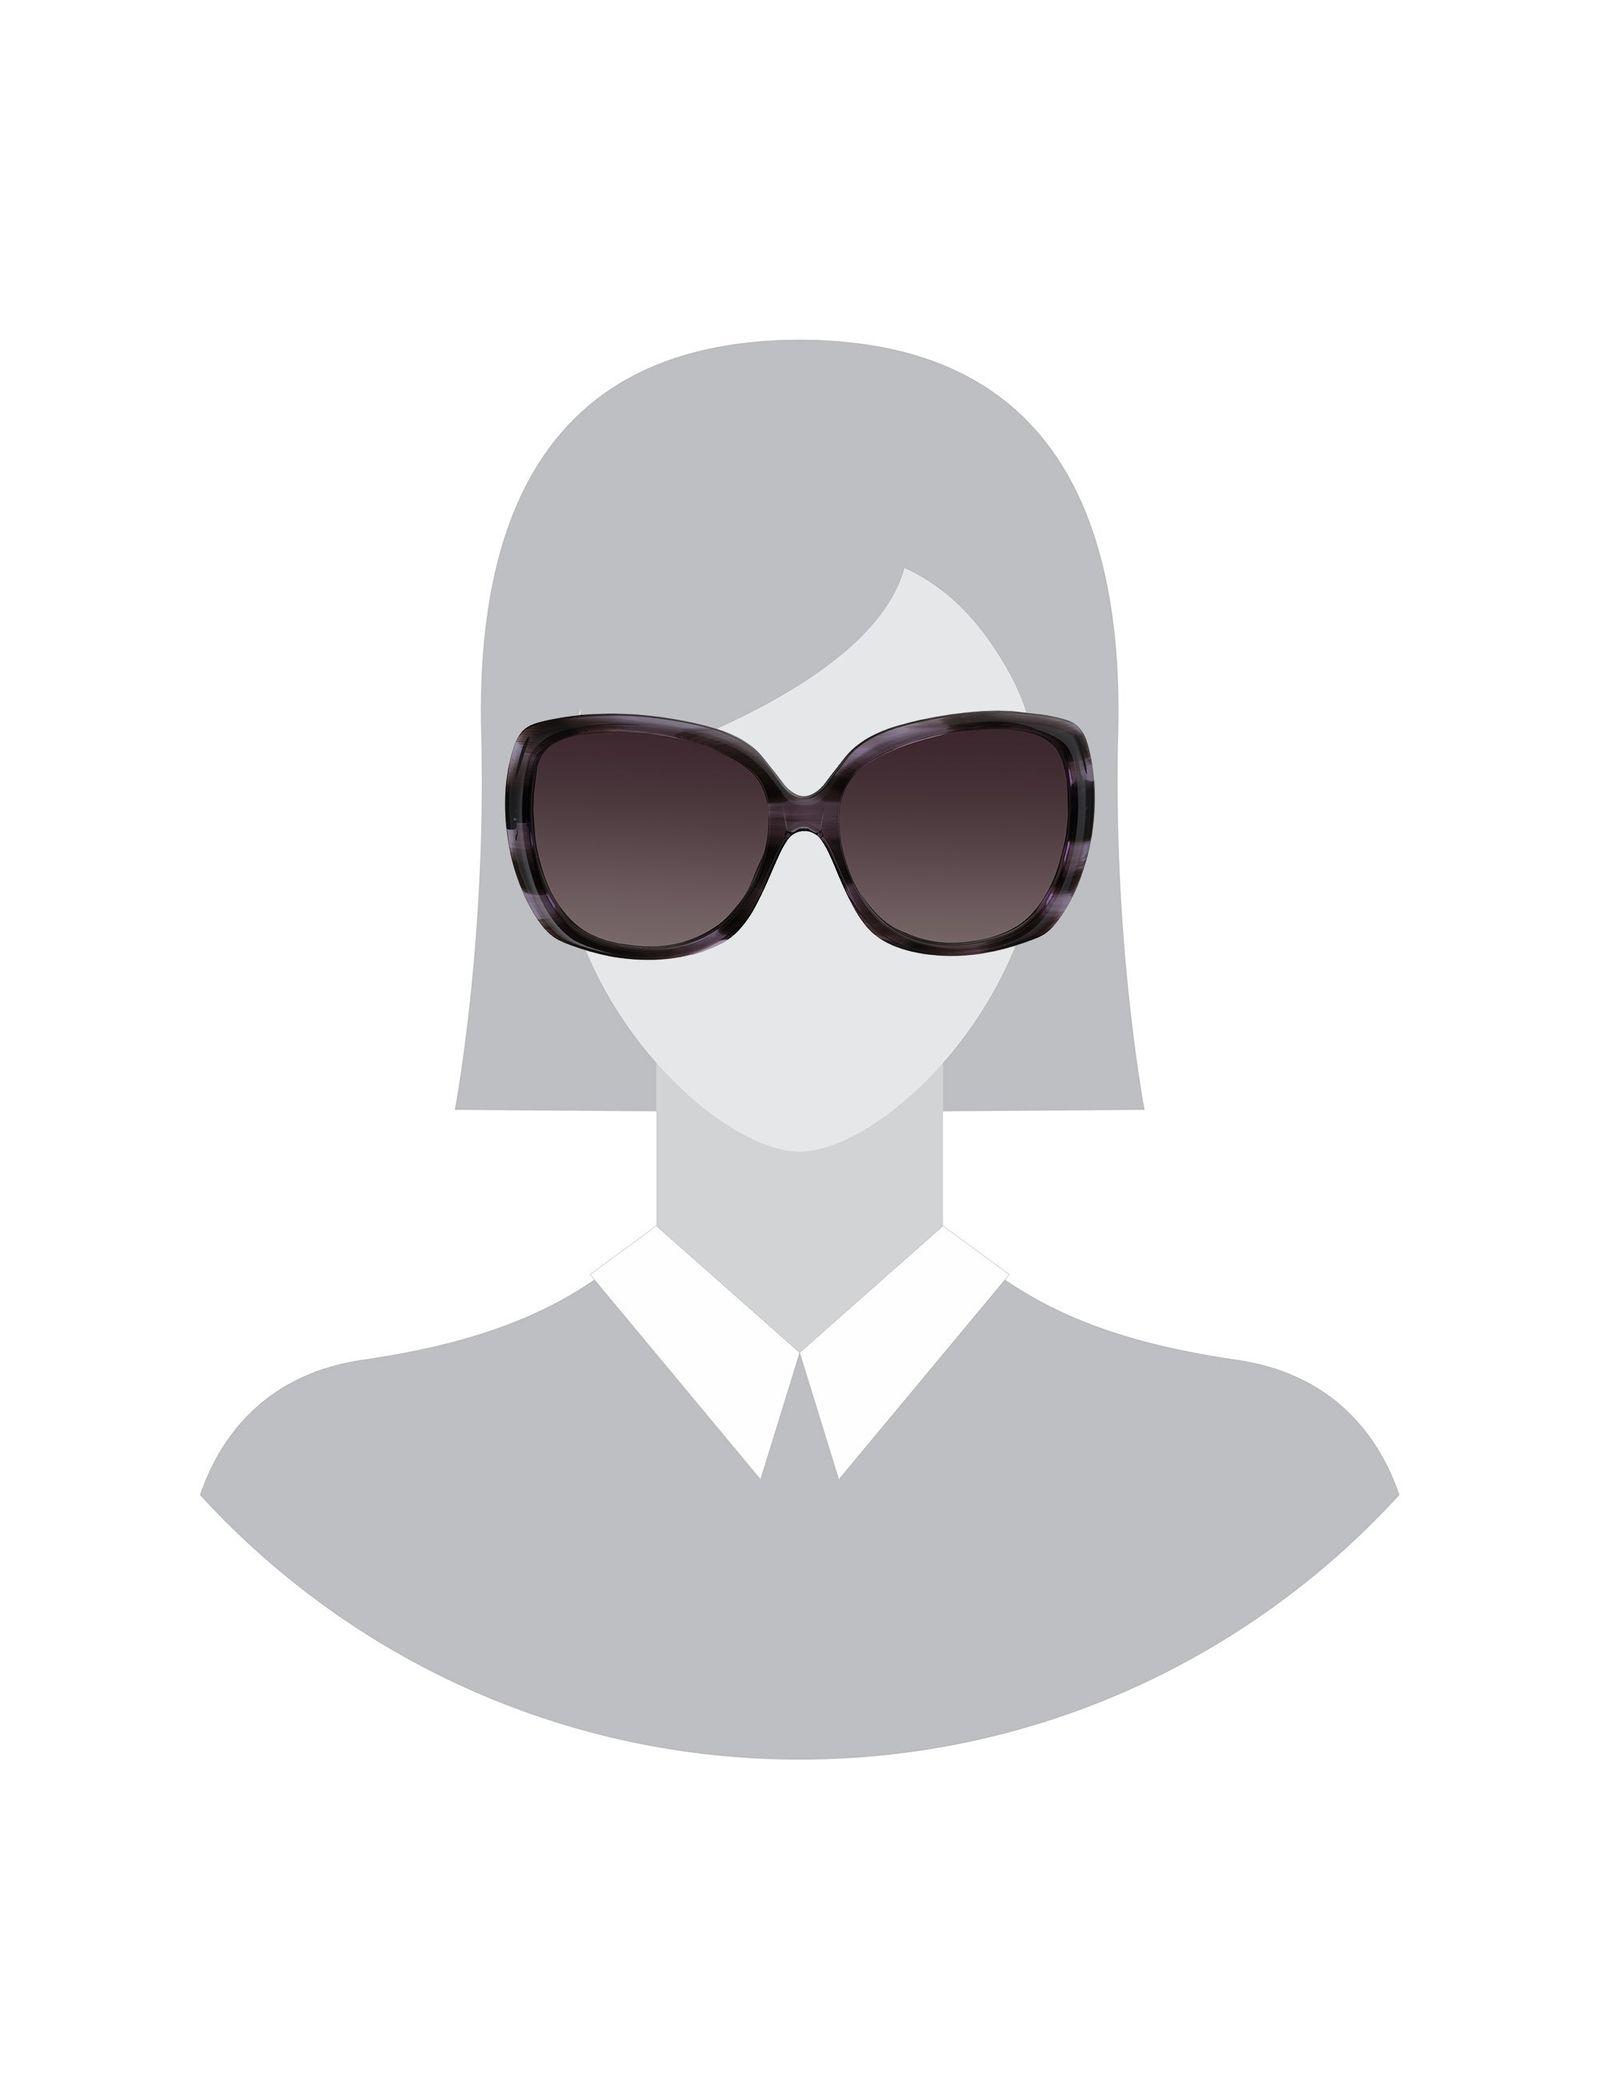 عینک آفتابی مربعی زنانه - ماریم اکو - بنفش   - 4